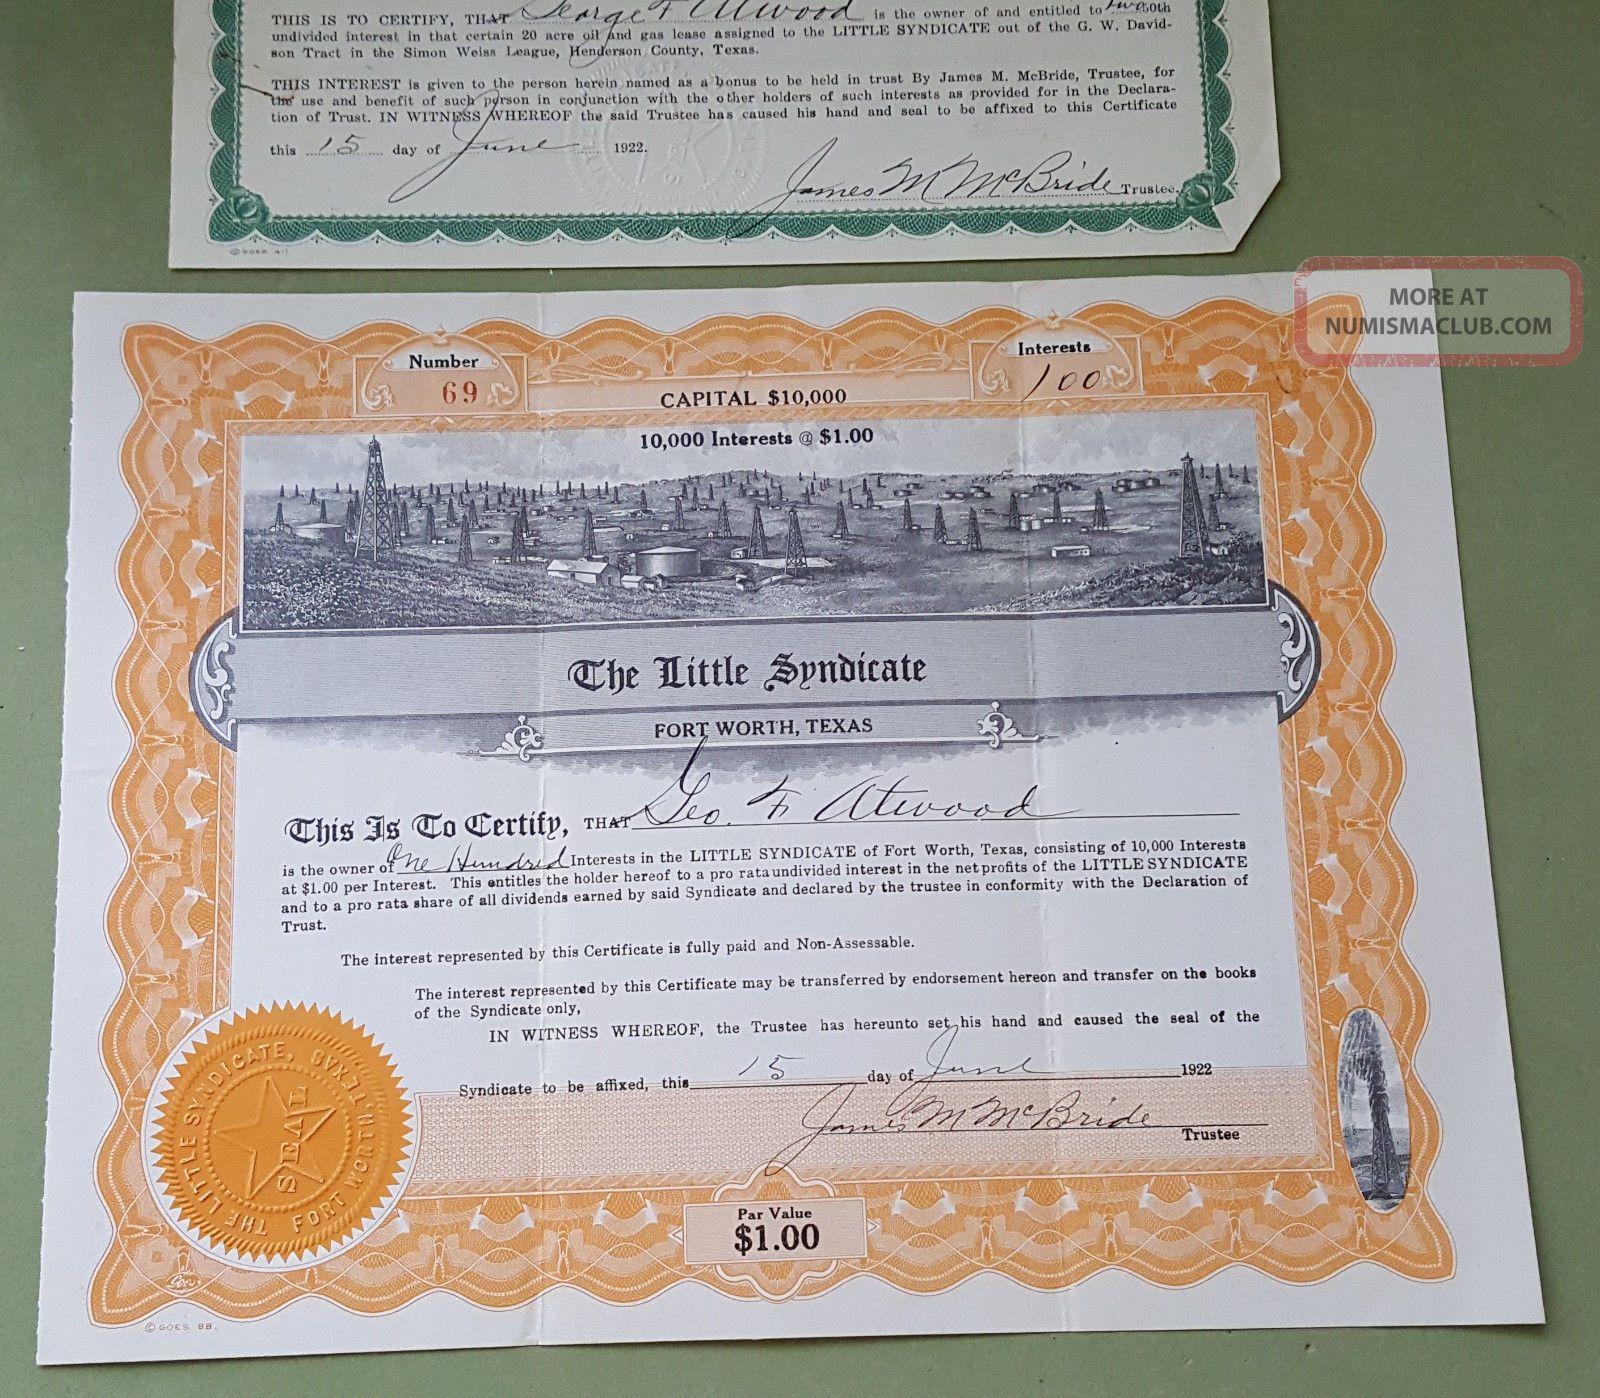 The Little Syndicate - Stock Interest Certificate - Fort Worth,  Tx 1922 W/bonus Stocks & Bonds, Scripophily photo